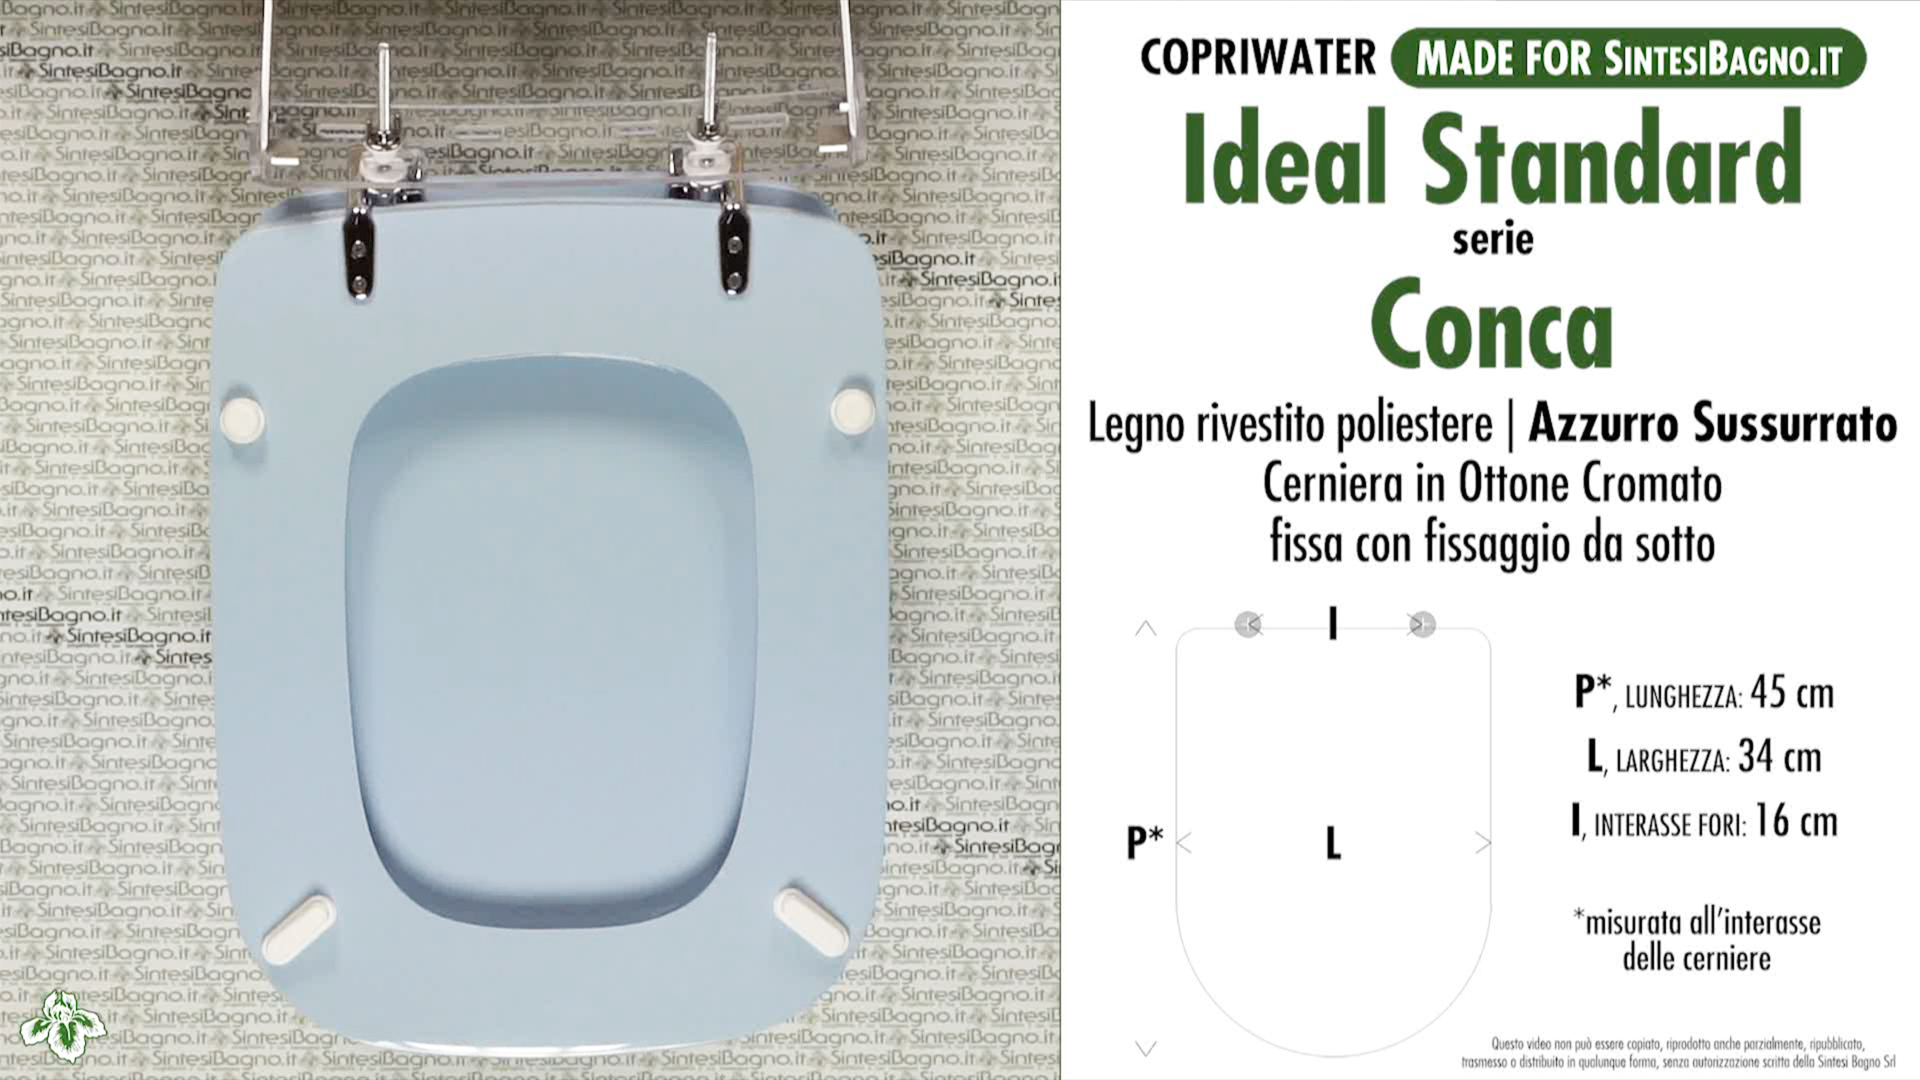 Schede tecniche misure copriwater ideal standard serie conca for Conca ideal standard